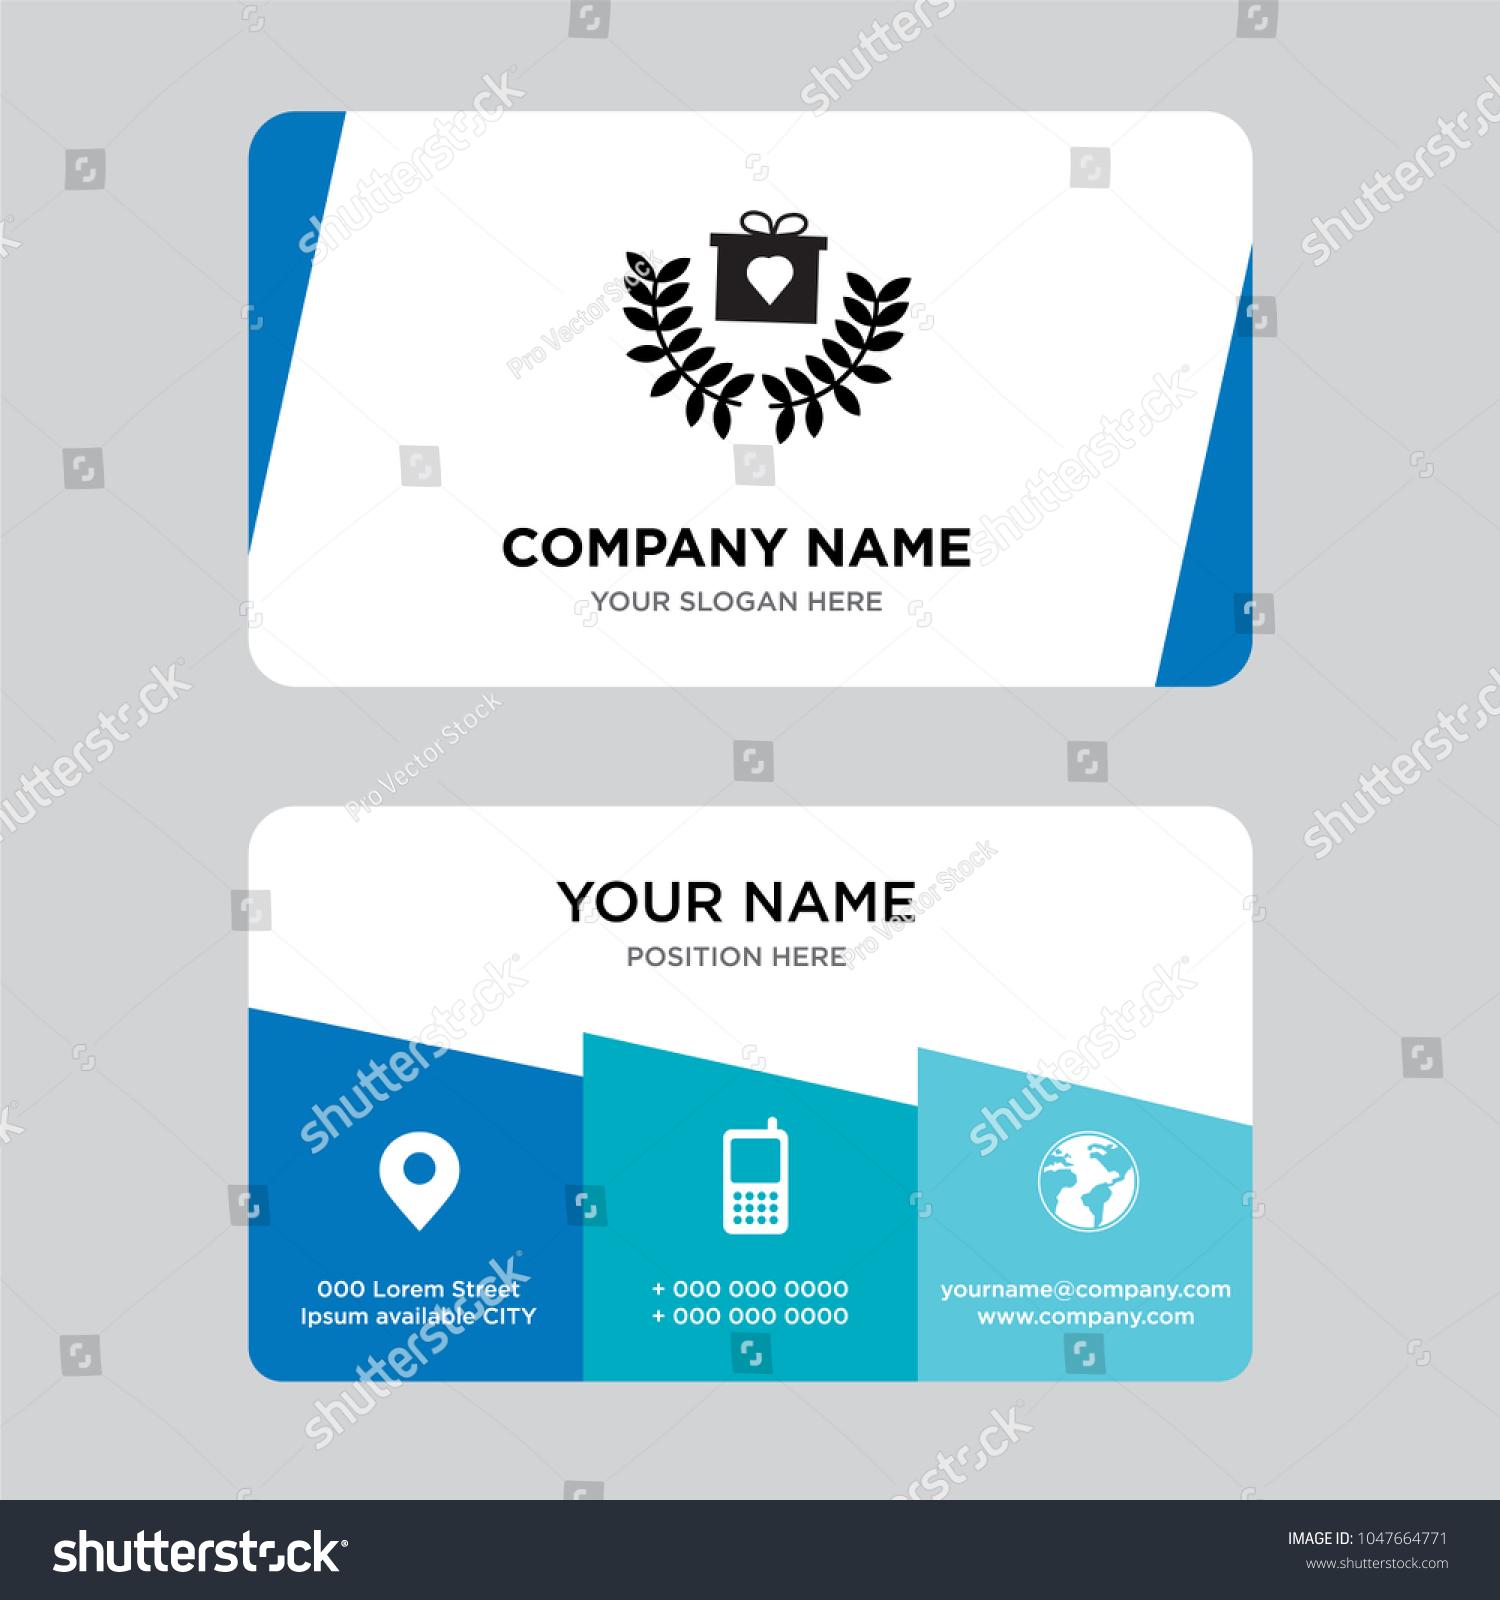 Loyalty Program Business Card Design Template Stock Photo (Photo ...